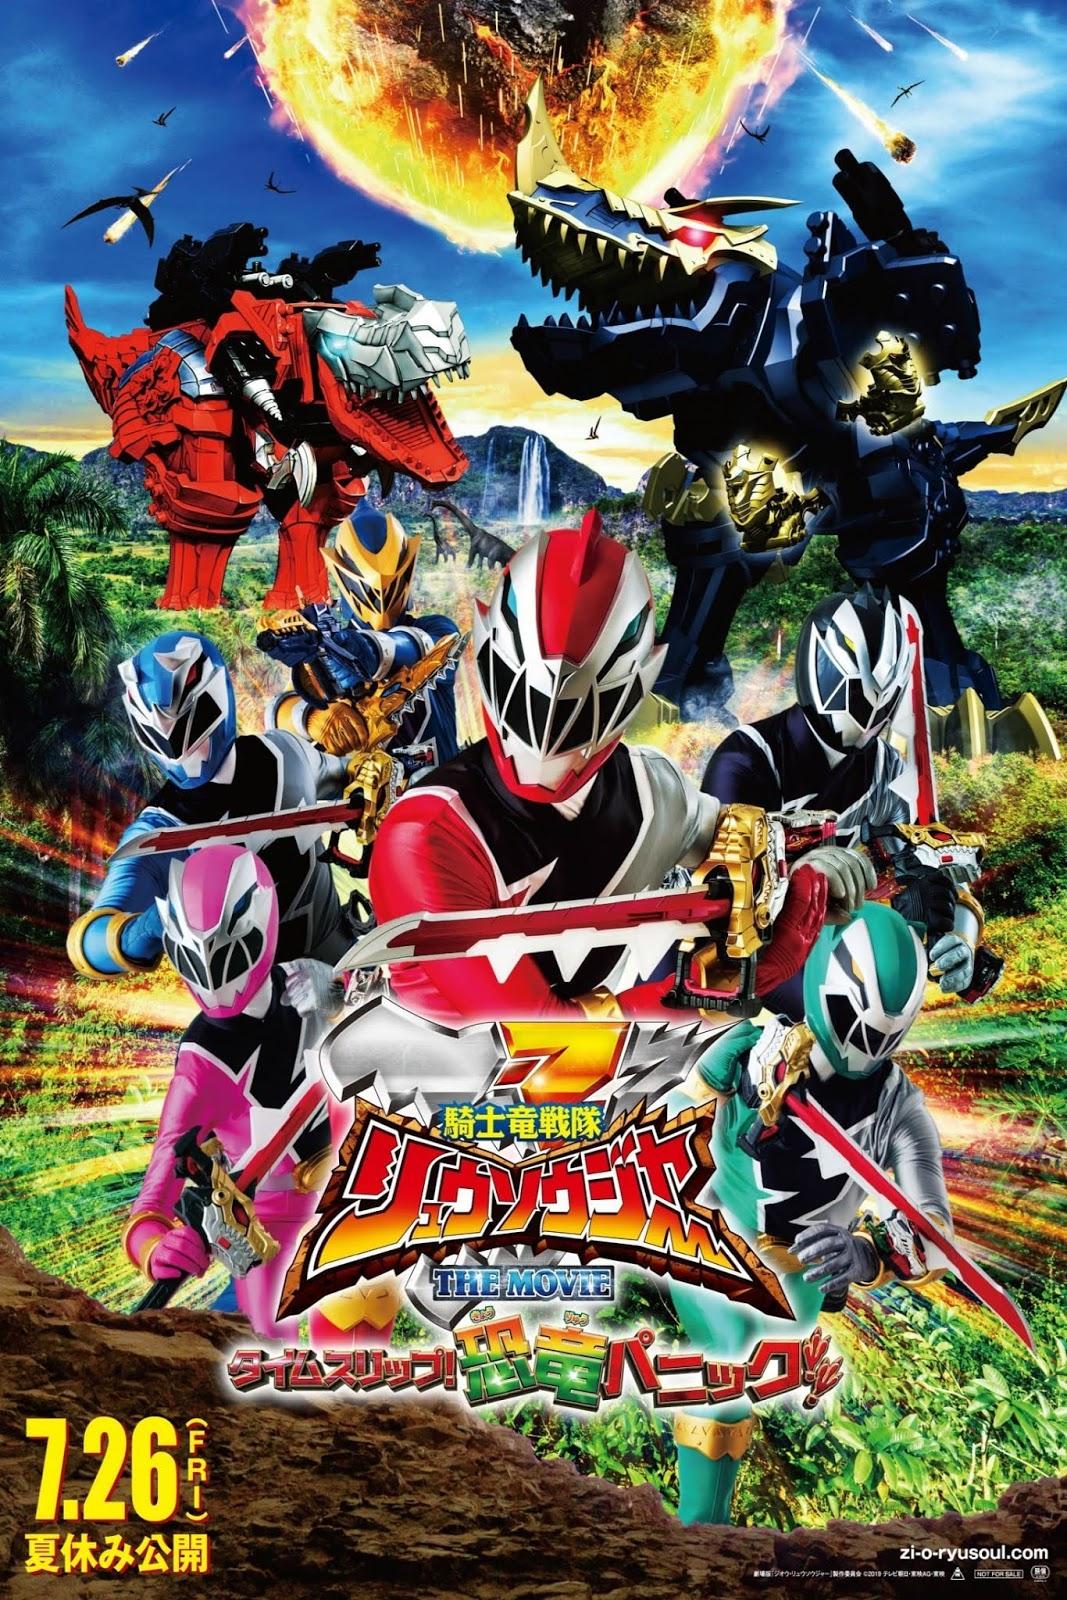 Kishiryu Sentai Ryusoulger The Movie: Time Slip! Dinosaur Panic